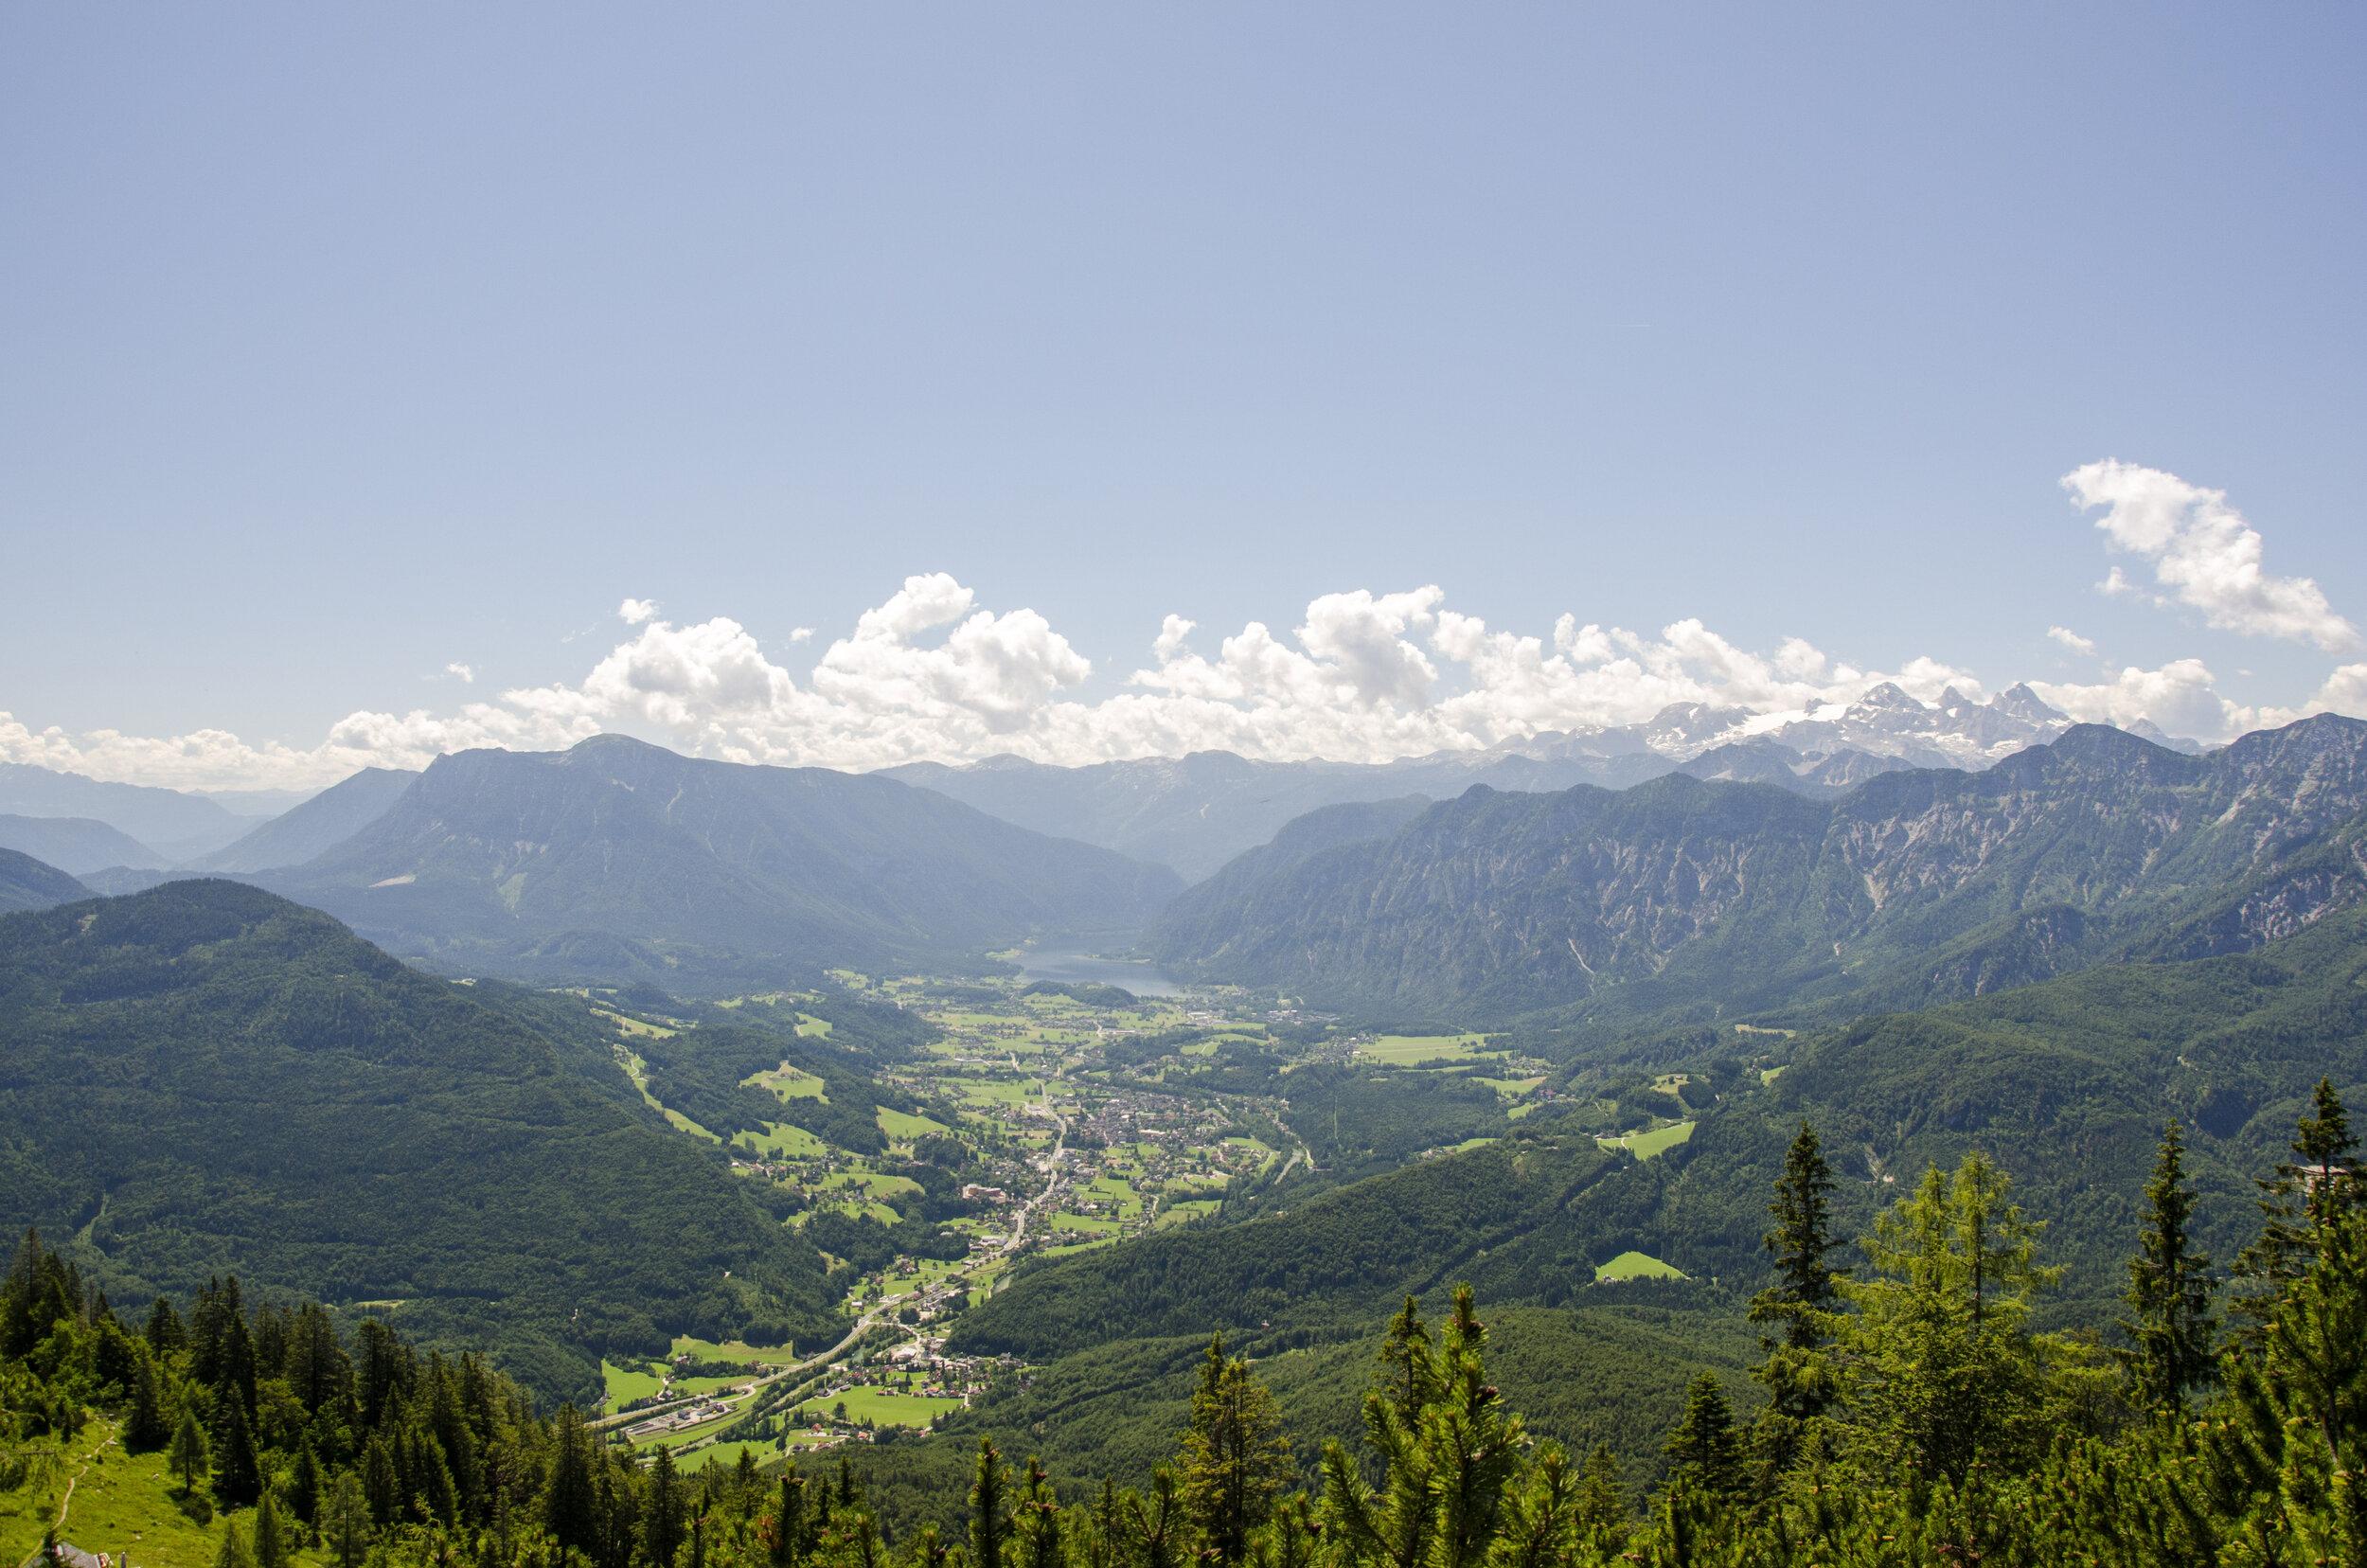 The view of Hallstatt Valley